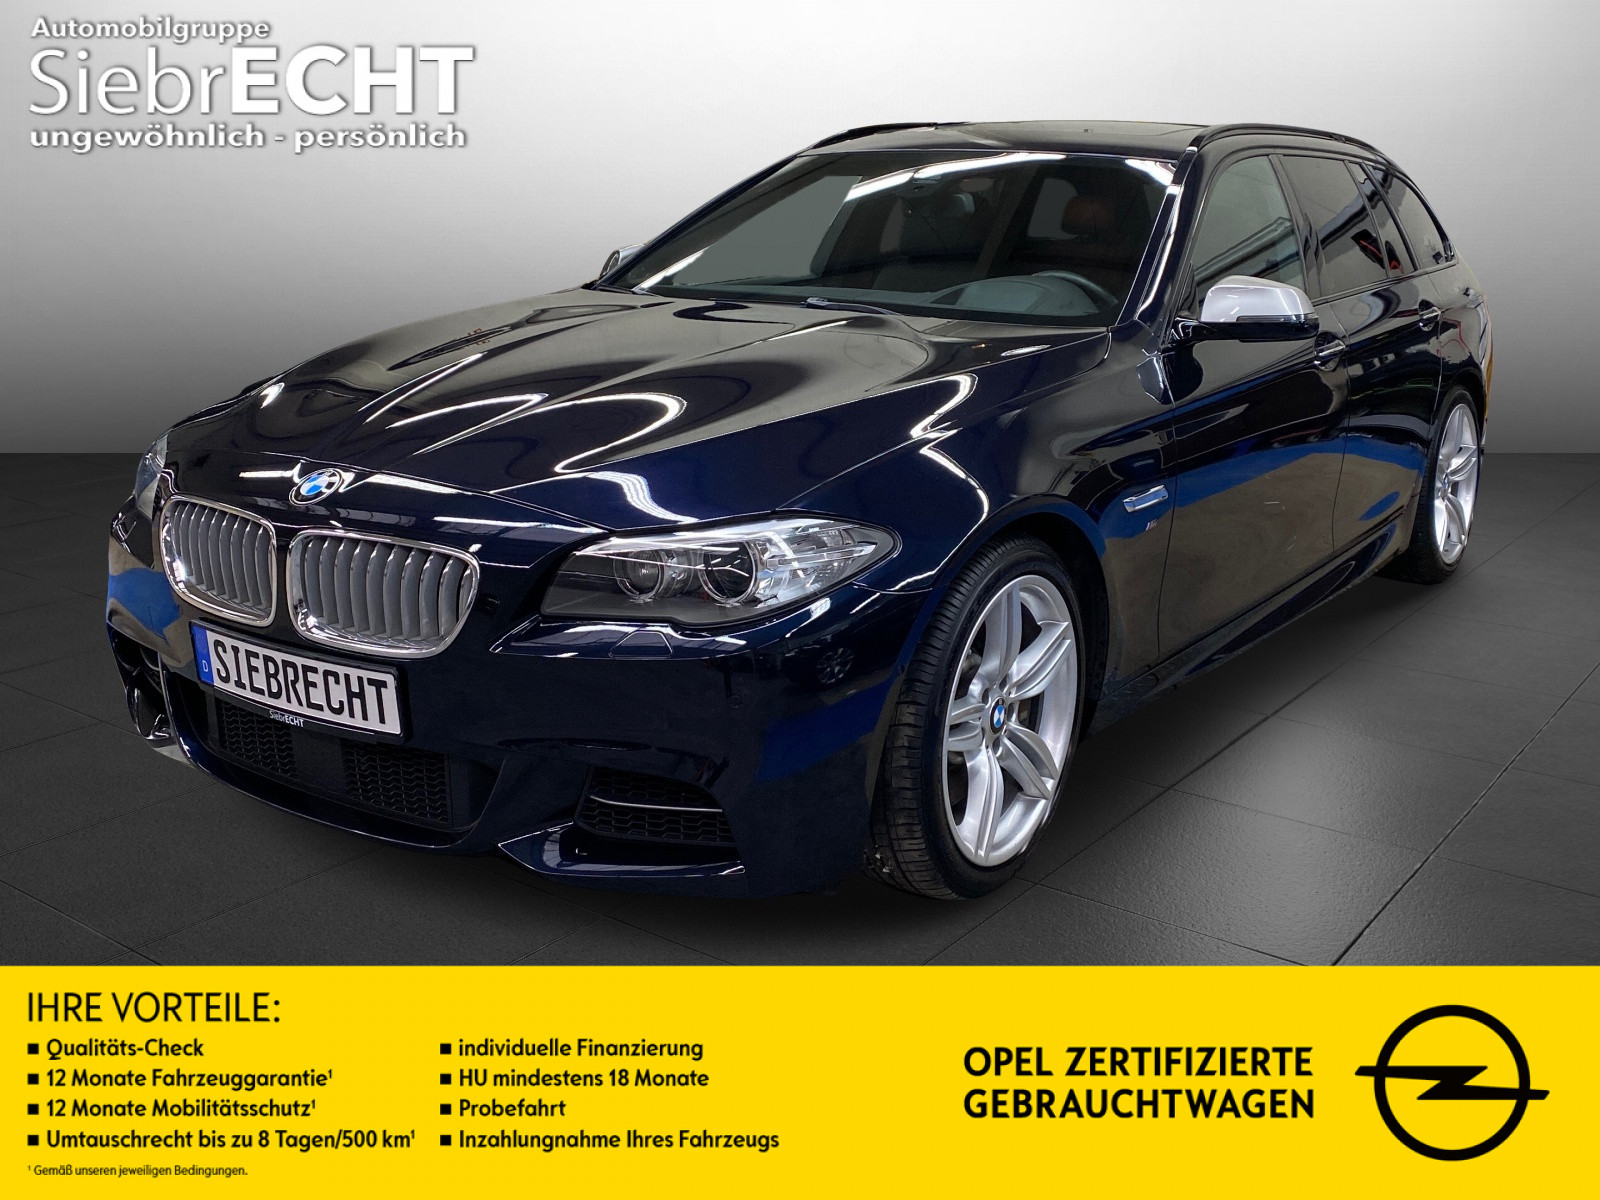 BMW M550 M550d xDrive 3.0 T D AT* Navi*4x4*Bi-Xenon*, Jahr 2015, Diesel